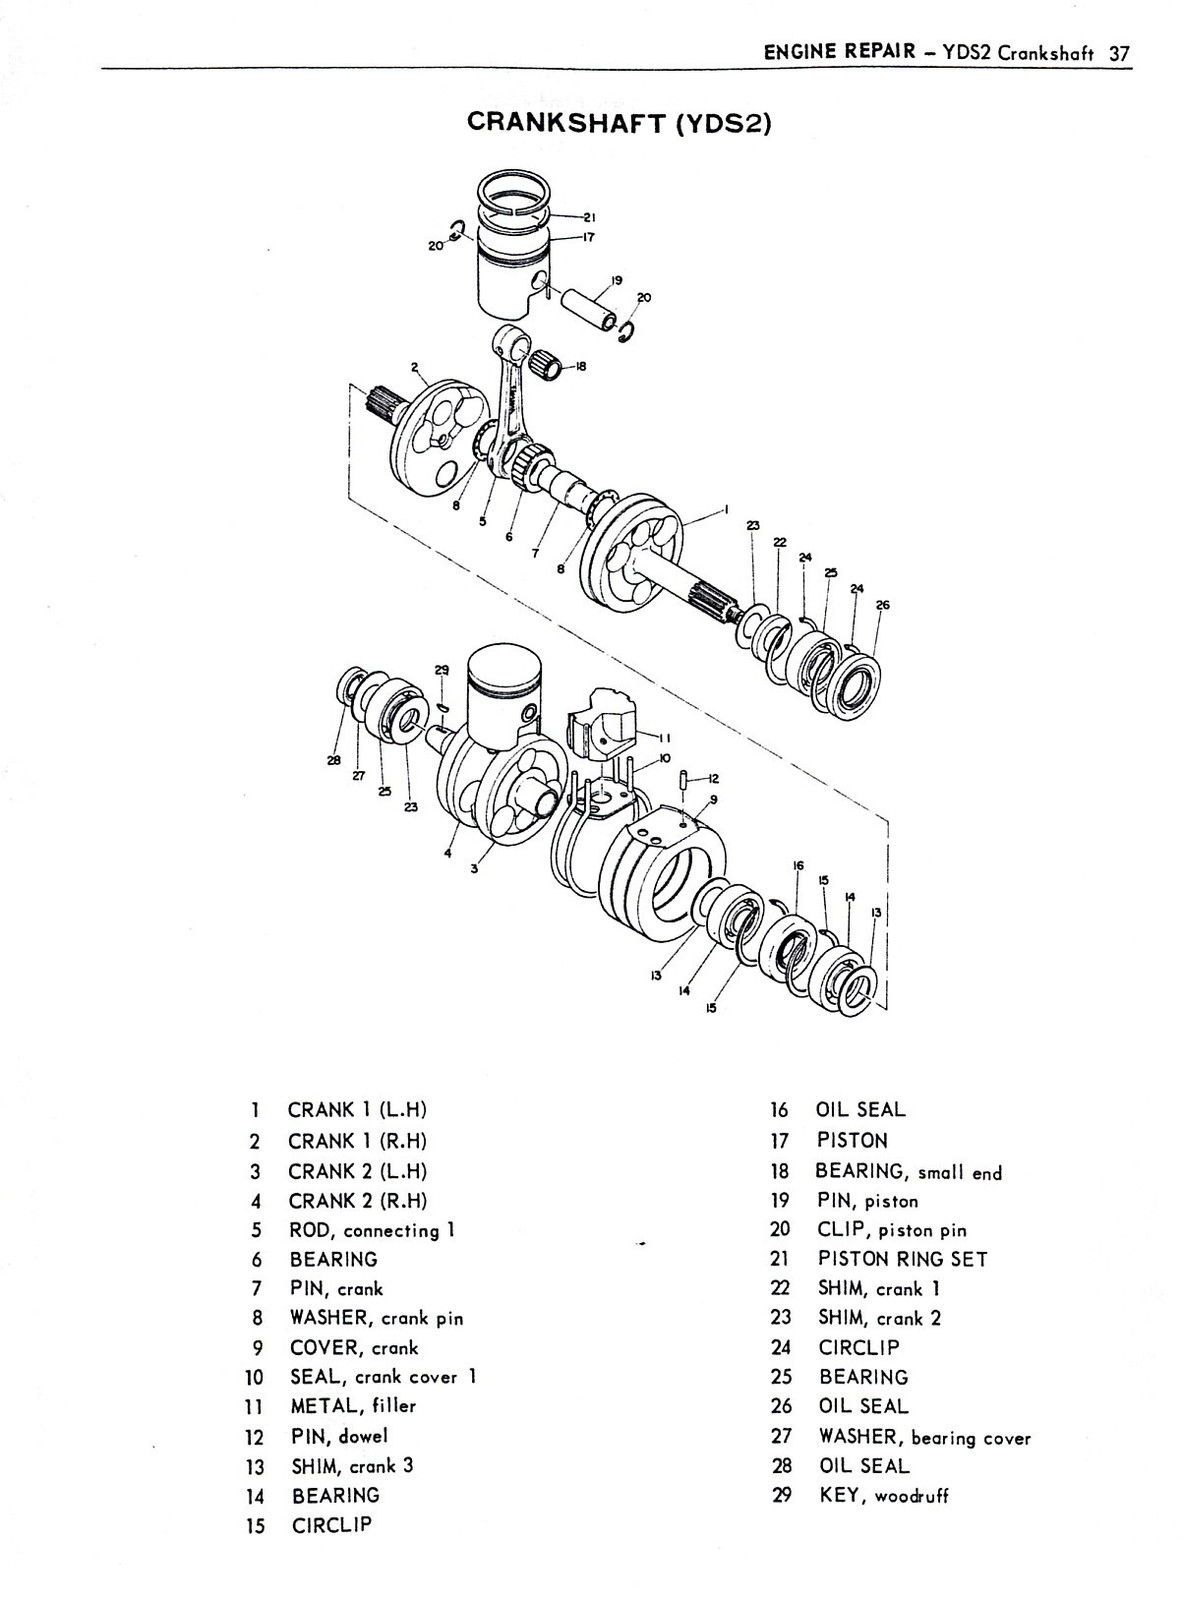 1962 1966 250 305 yamaha twins service manual ym1 yd3 yds2 yds3c vjmc yd2 yds1 ebay [ 1182 x 1600 Pixel ]